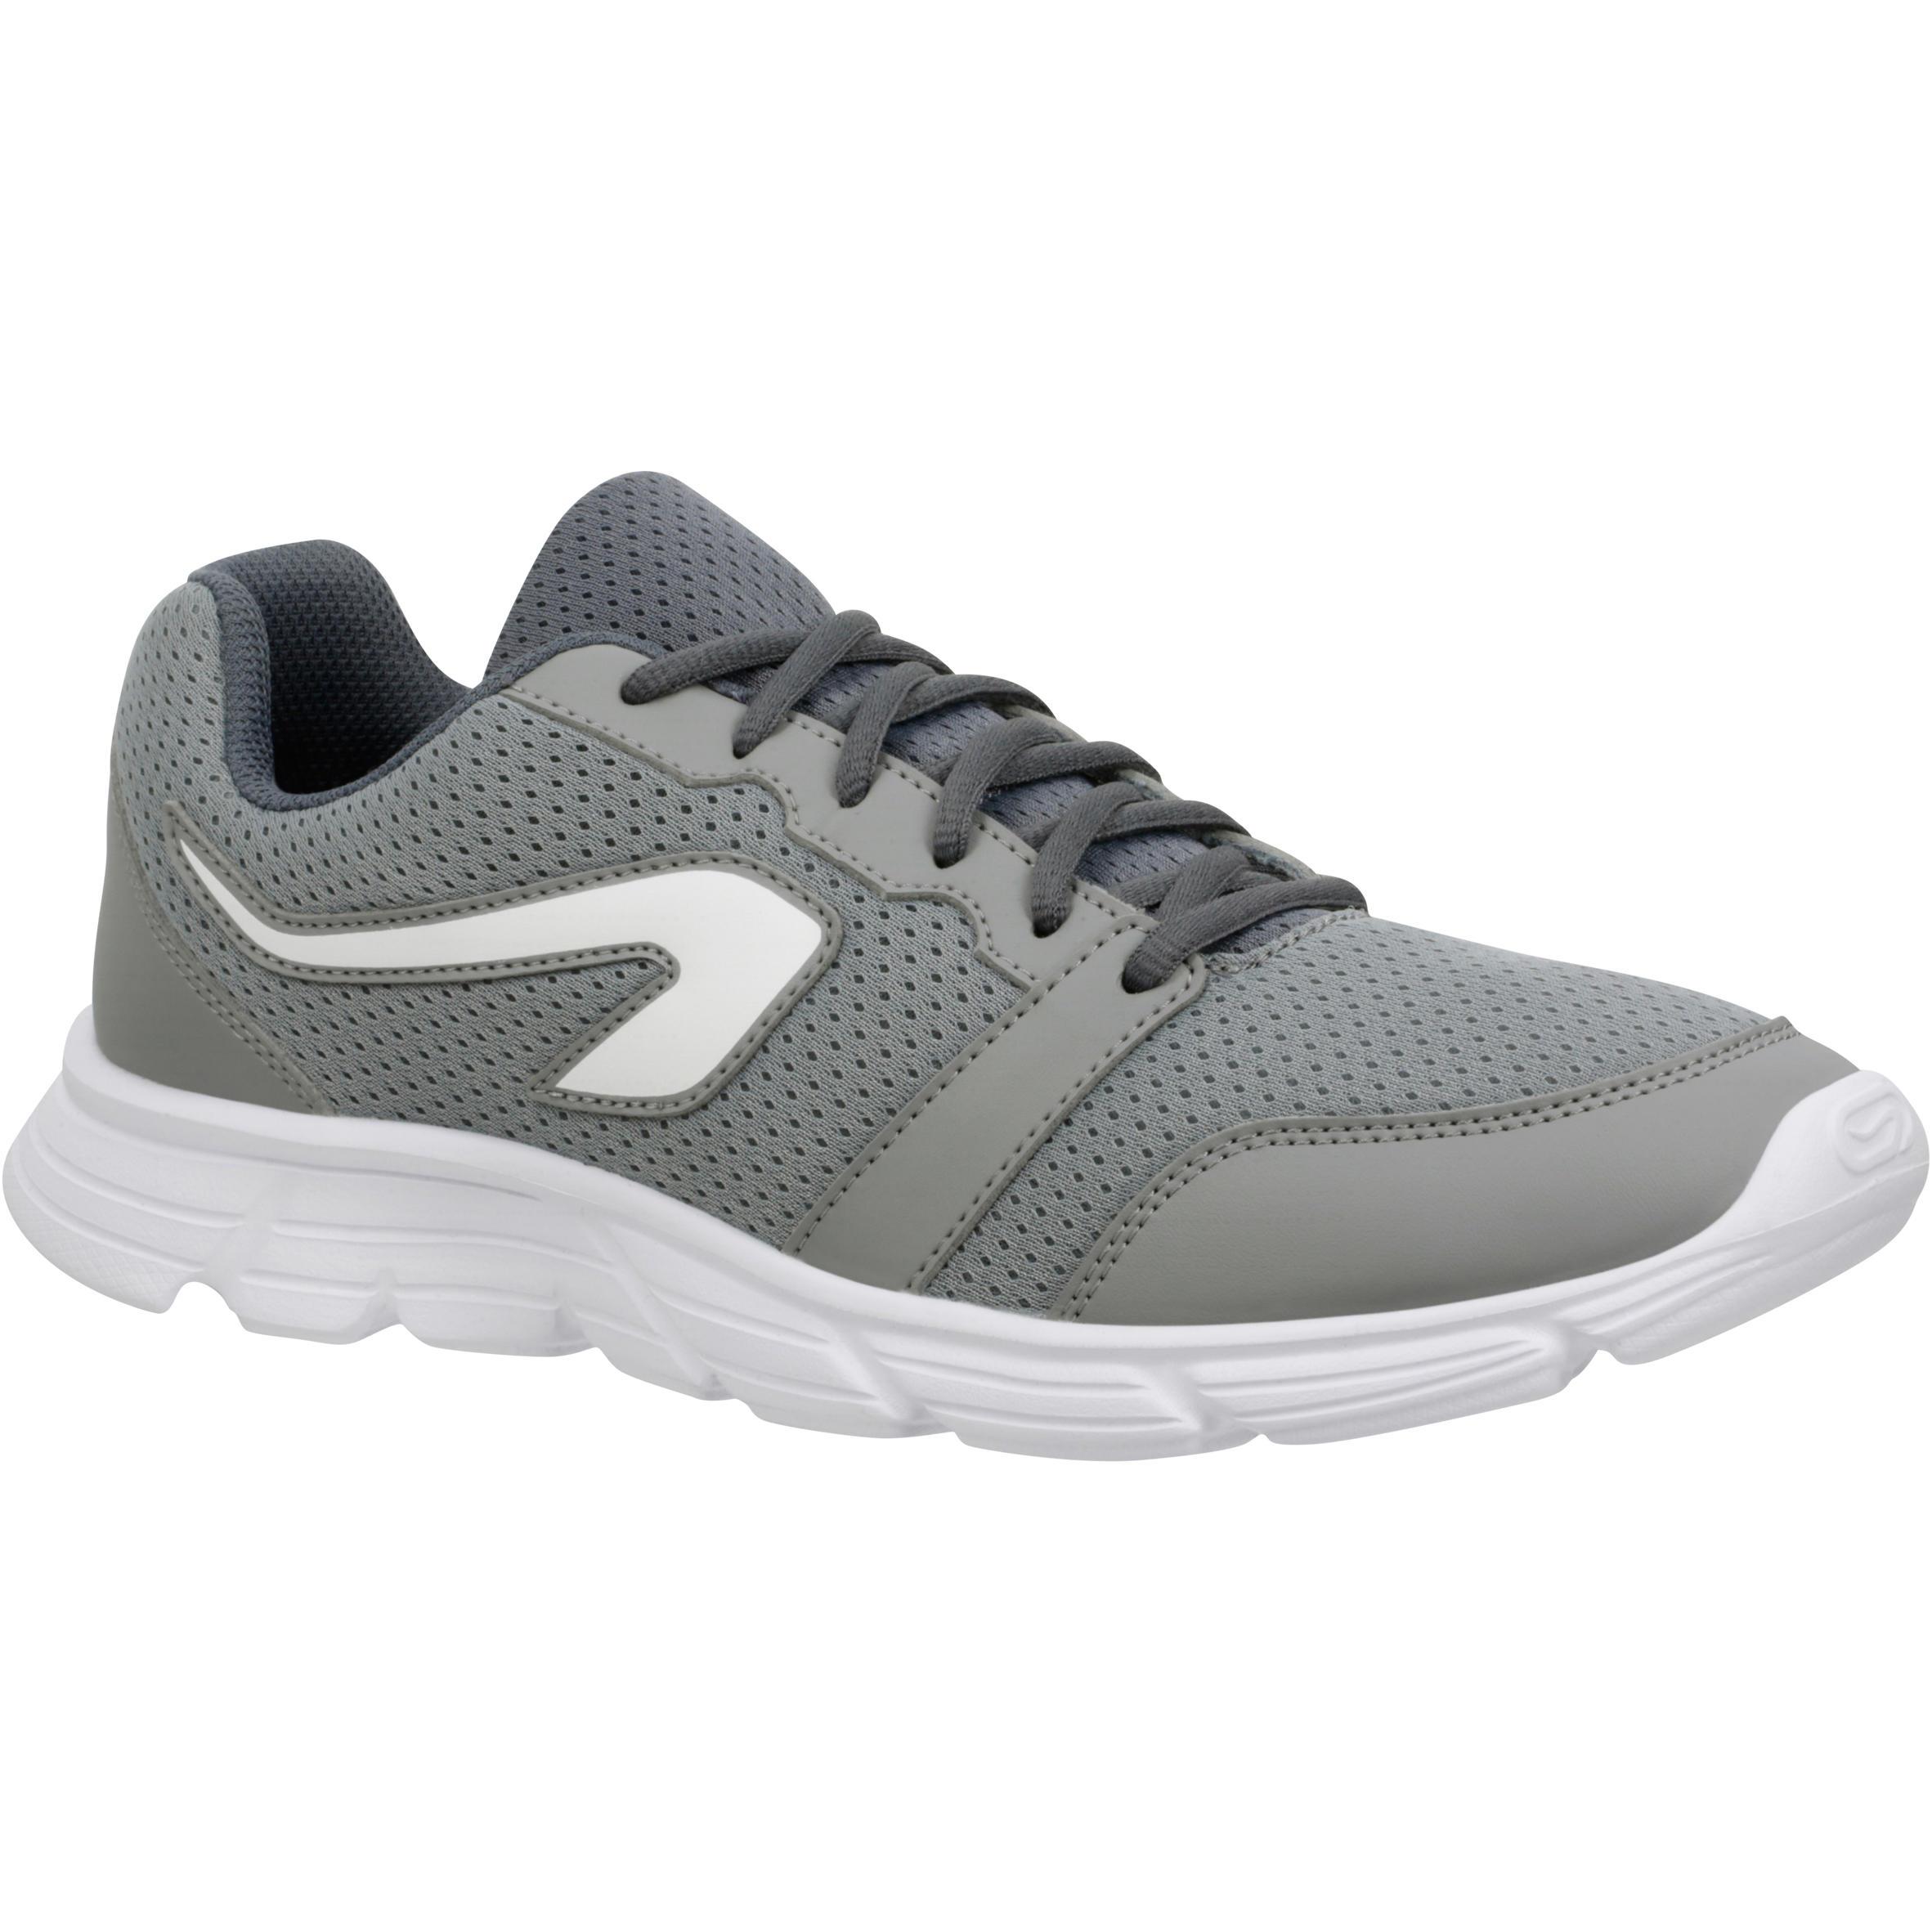 Buy Running Shoes for Men Run 100|Buy